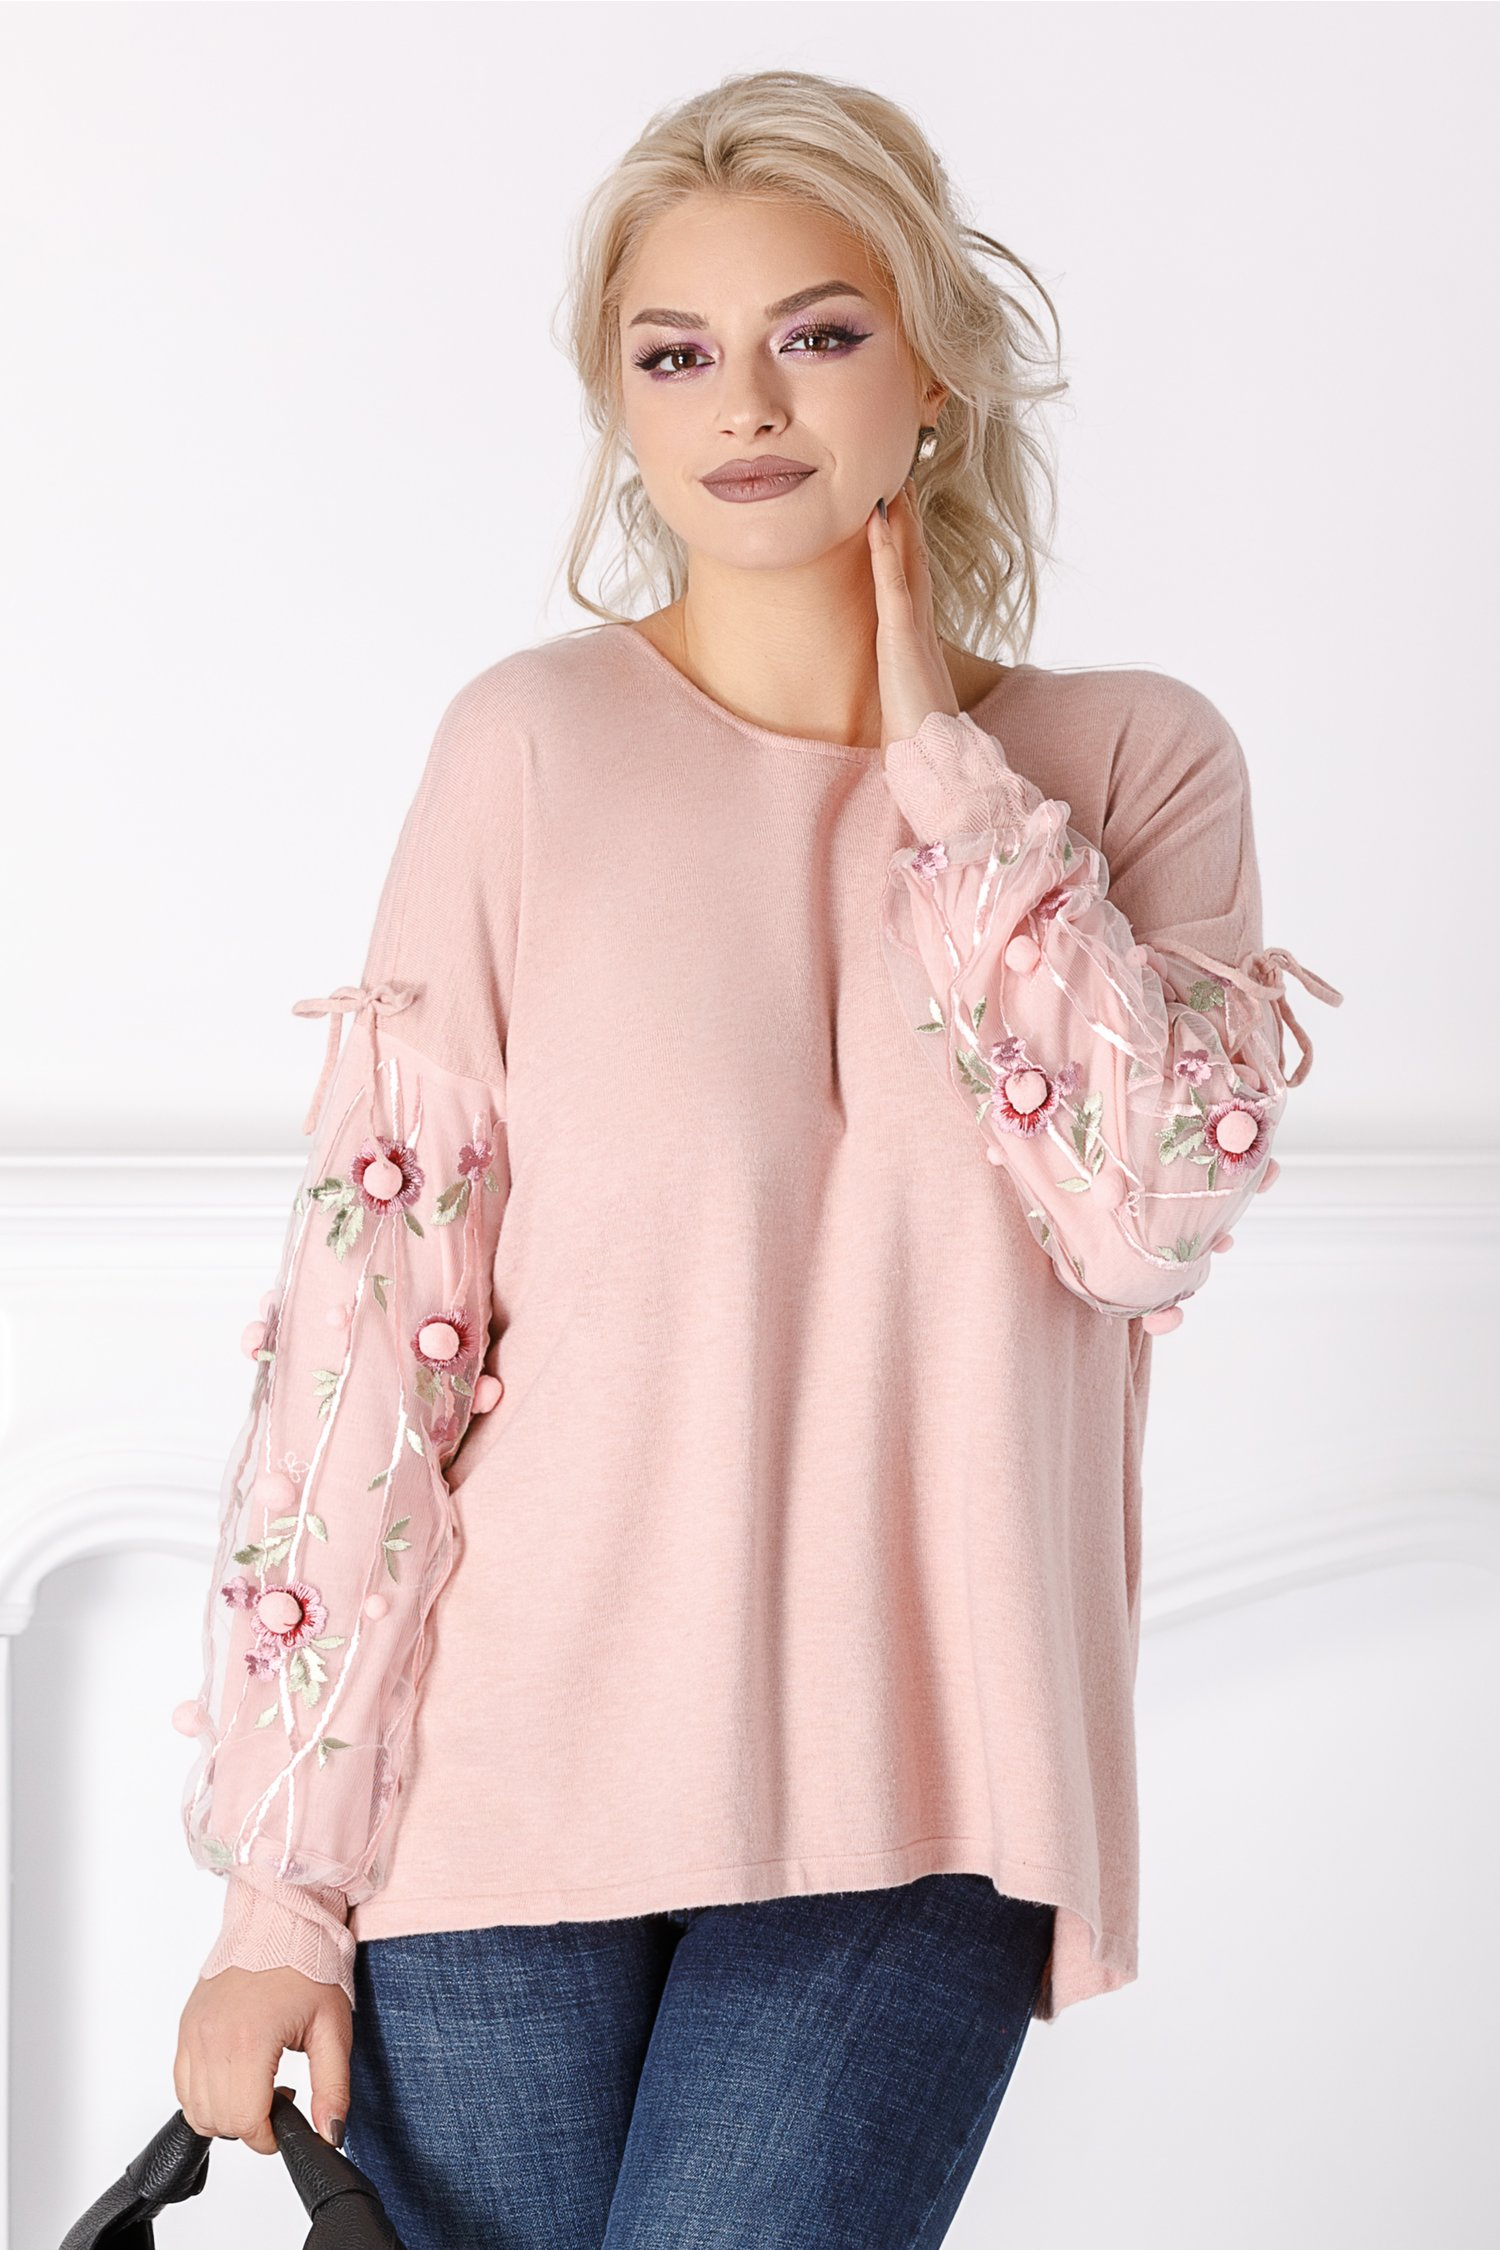 Bluza Kira roz cu flori 3D la maneci